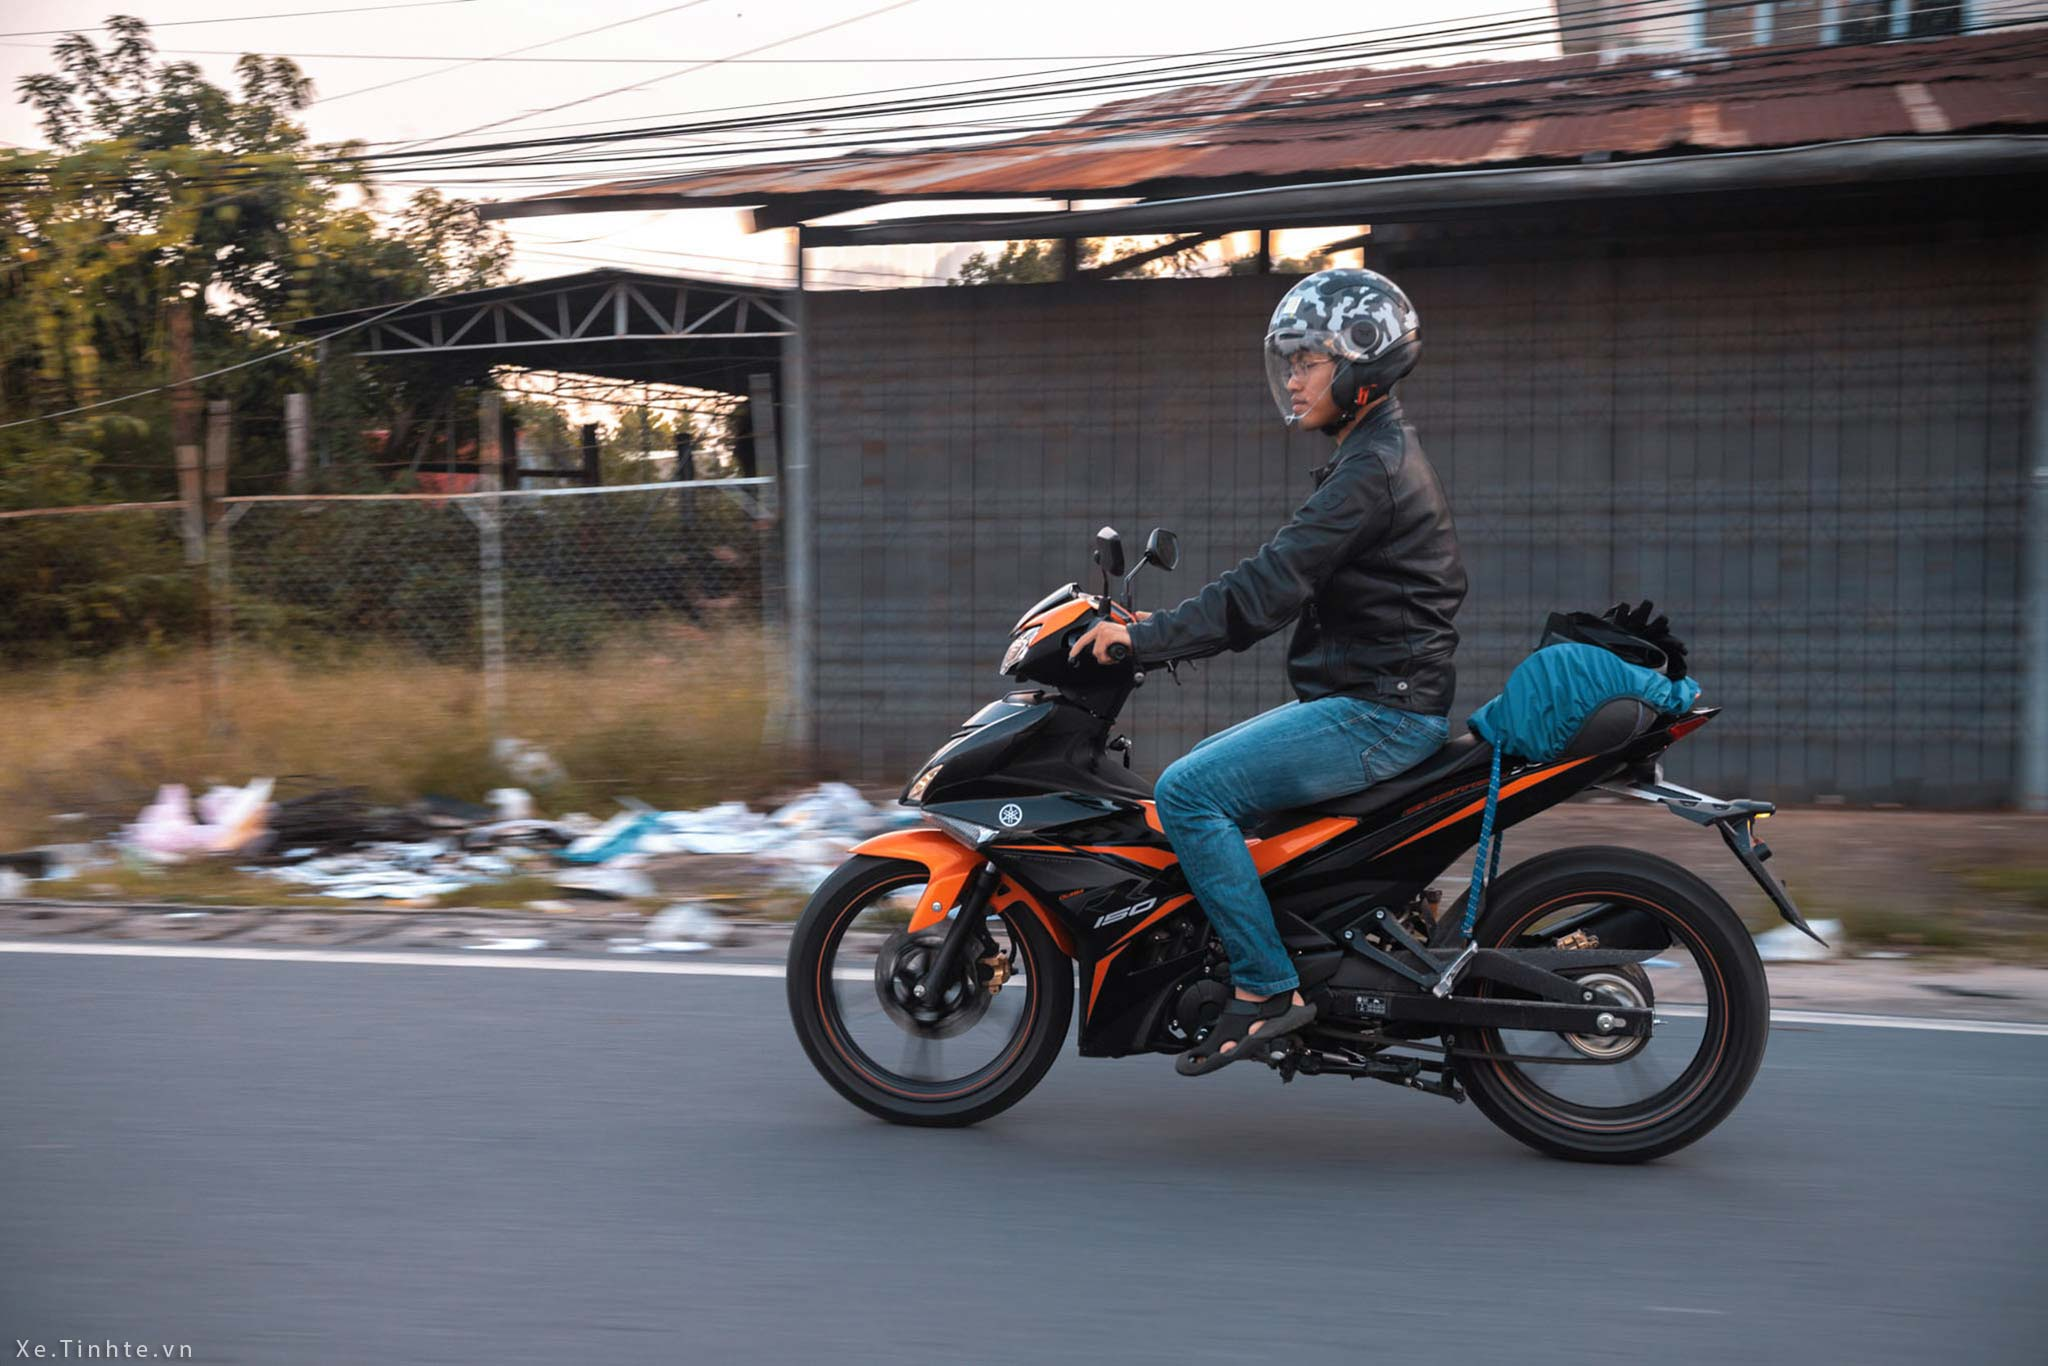 Yamaha-Exciter-150-2018-Xe-Tinhte (7).jpg